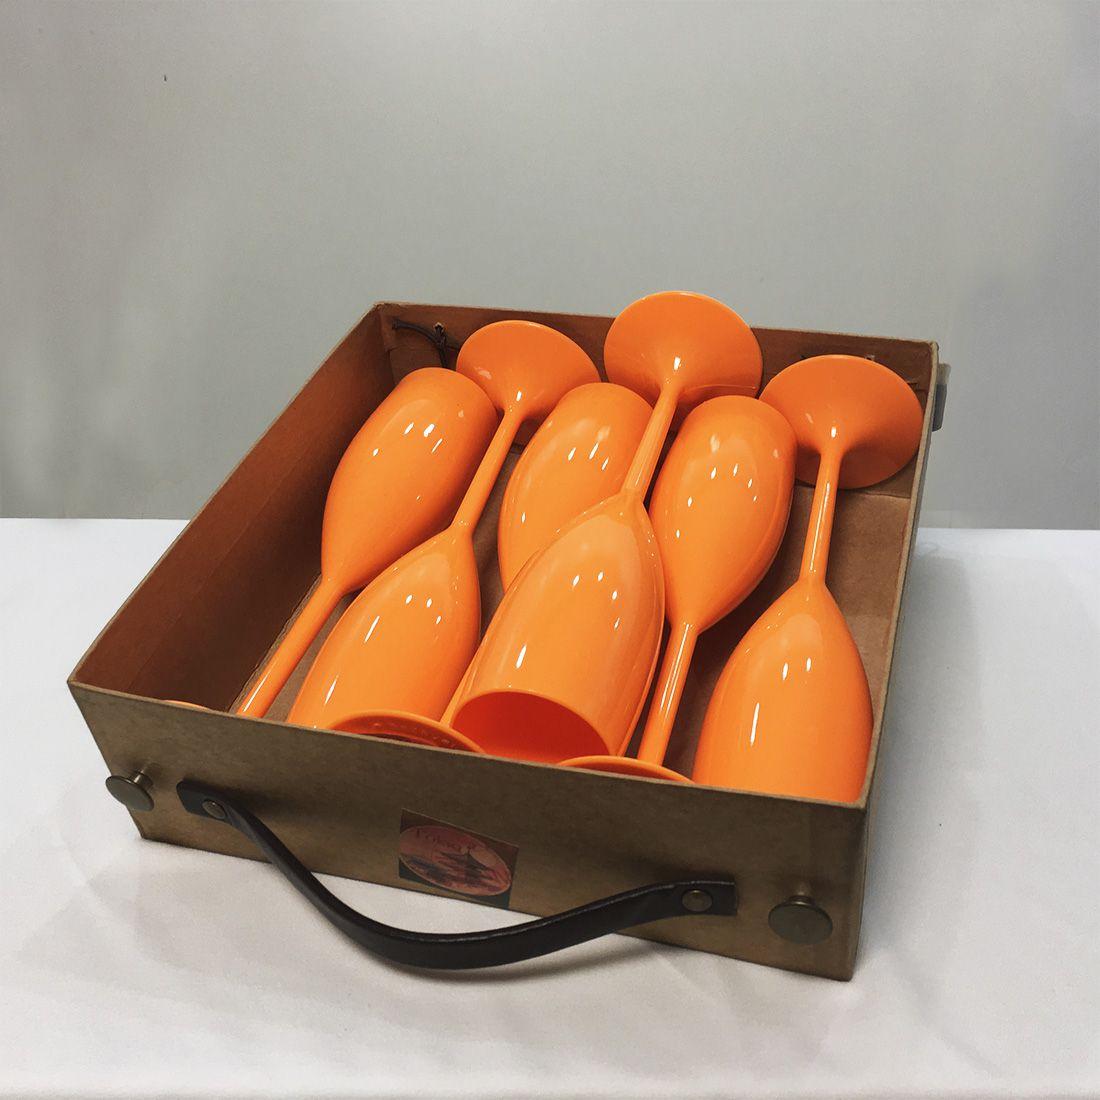 Kit 6 Taças para Champanhe 150ml + Caixa